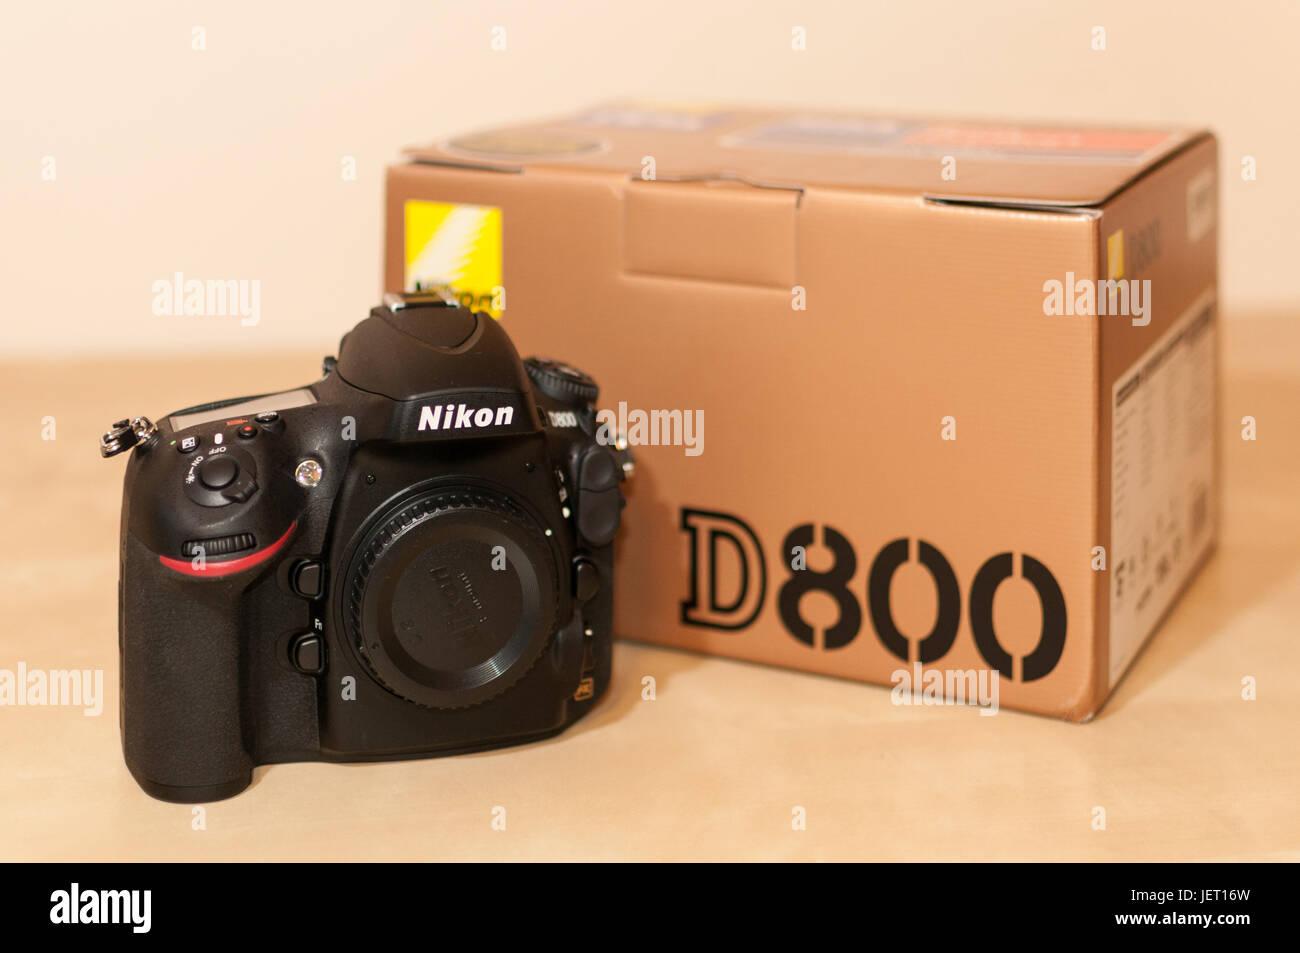 Nikon D800 DSLR With Box - Stock Image